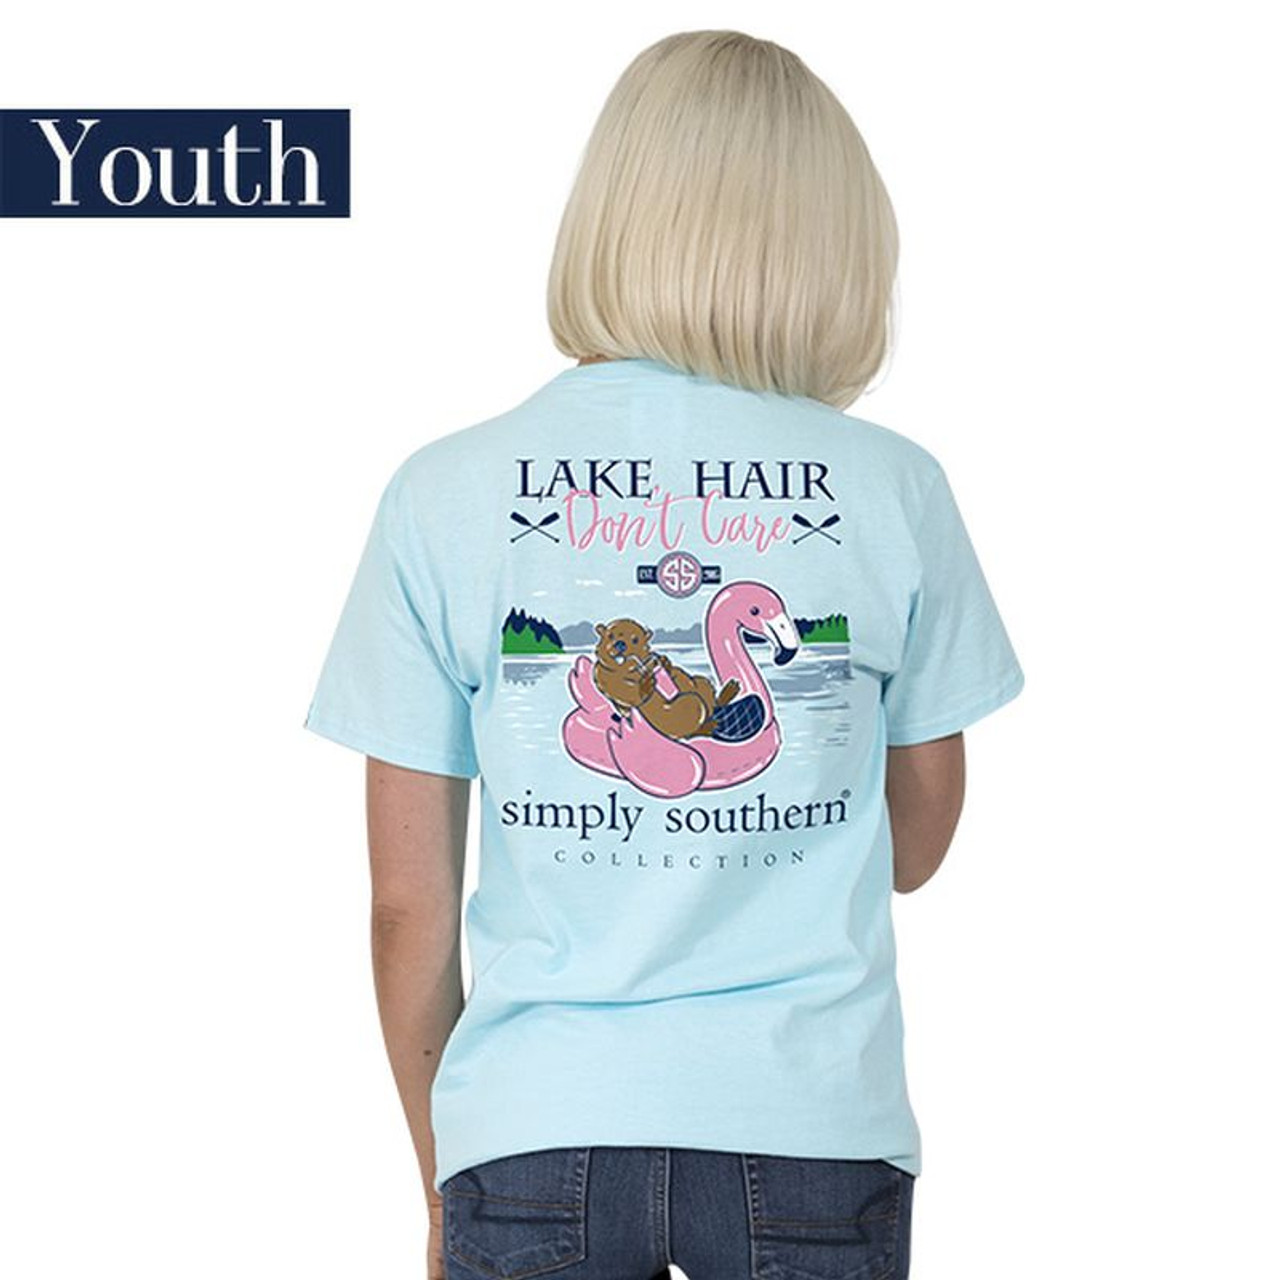 e51ffb190 YOUTH Lake Hair Don't Care Flamingo 2018 Simply Southern Tee Shirt ...